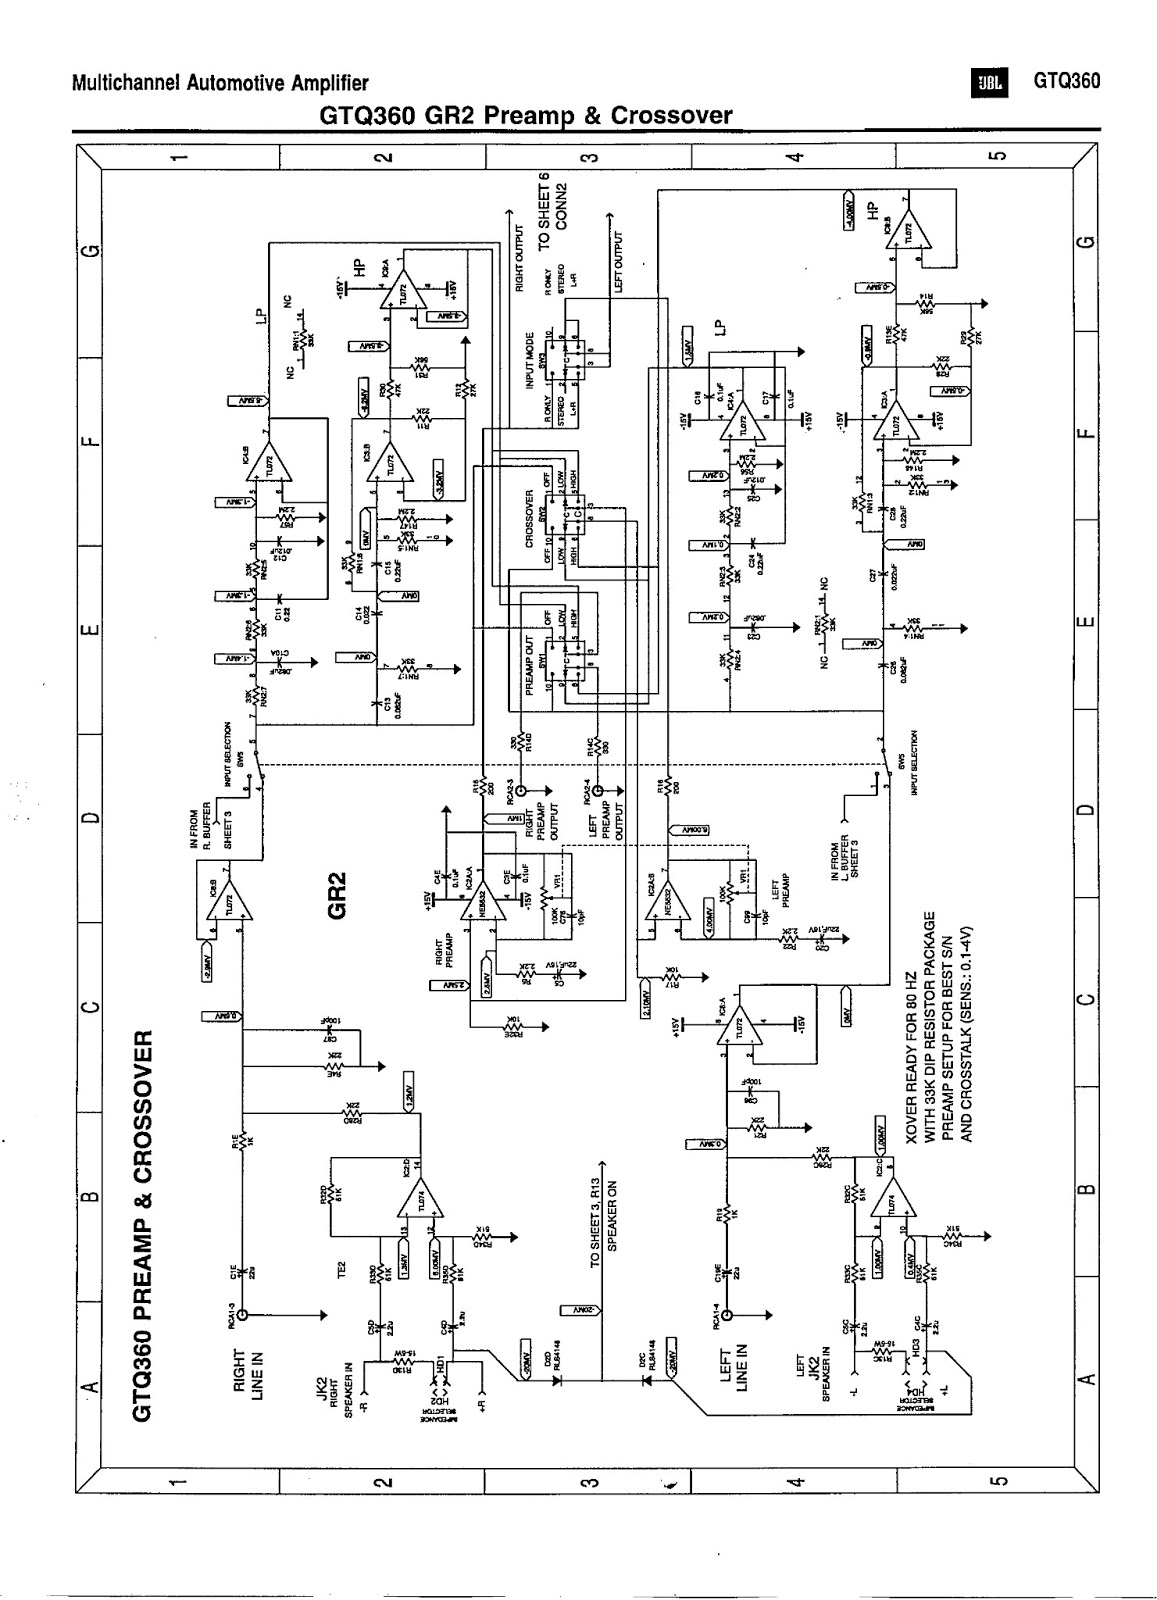 vizio main circuit board diagram  vizio  get free image